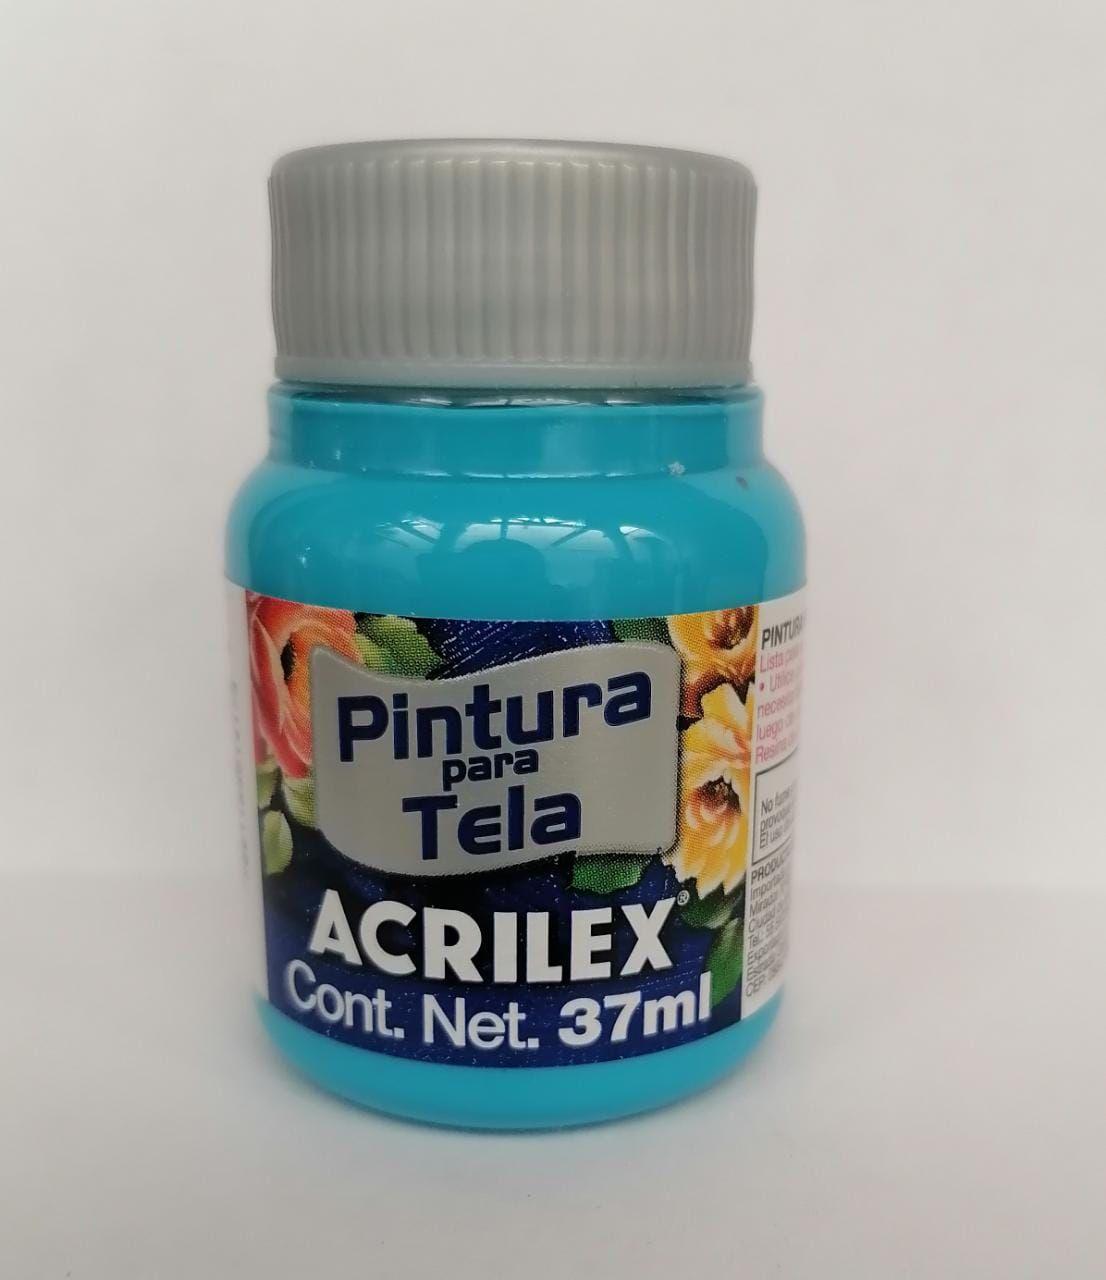 PINTURA PARA TELA ACRILEX AZUL MAR 37 ML